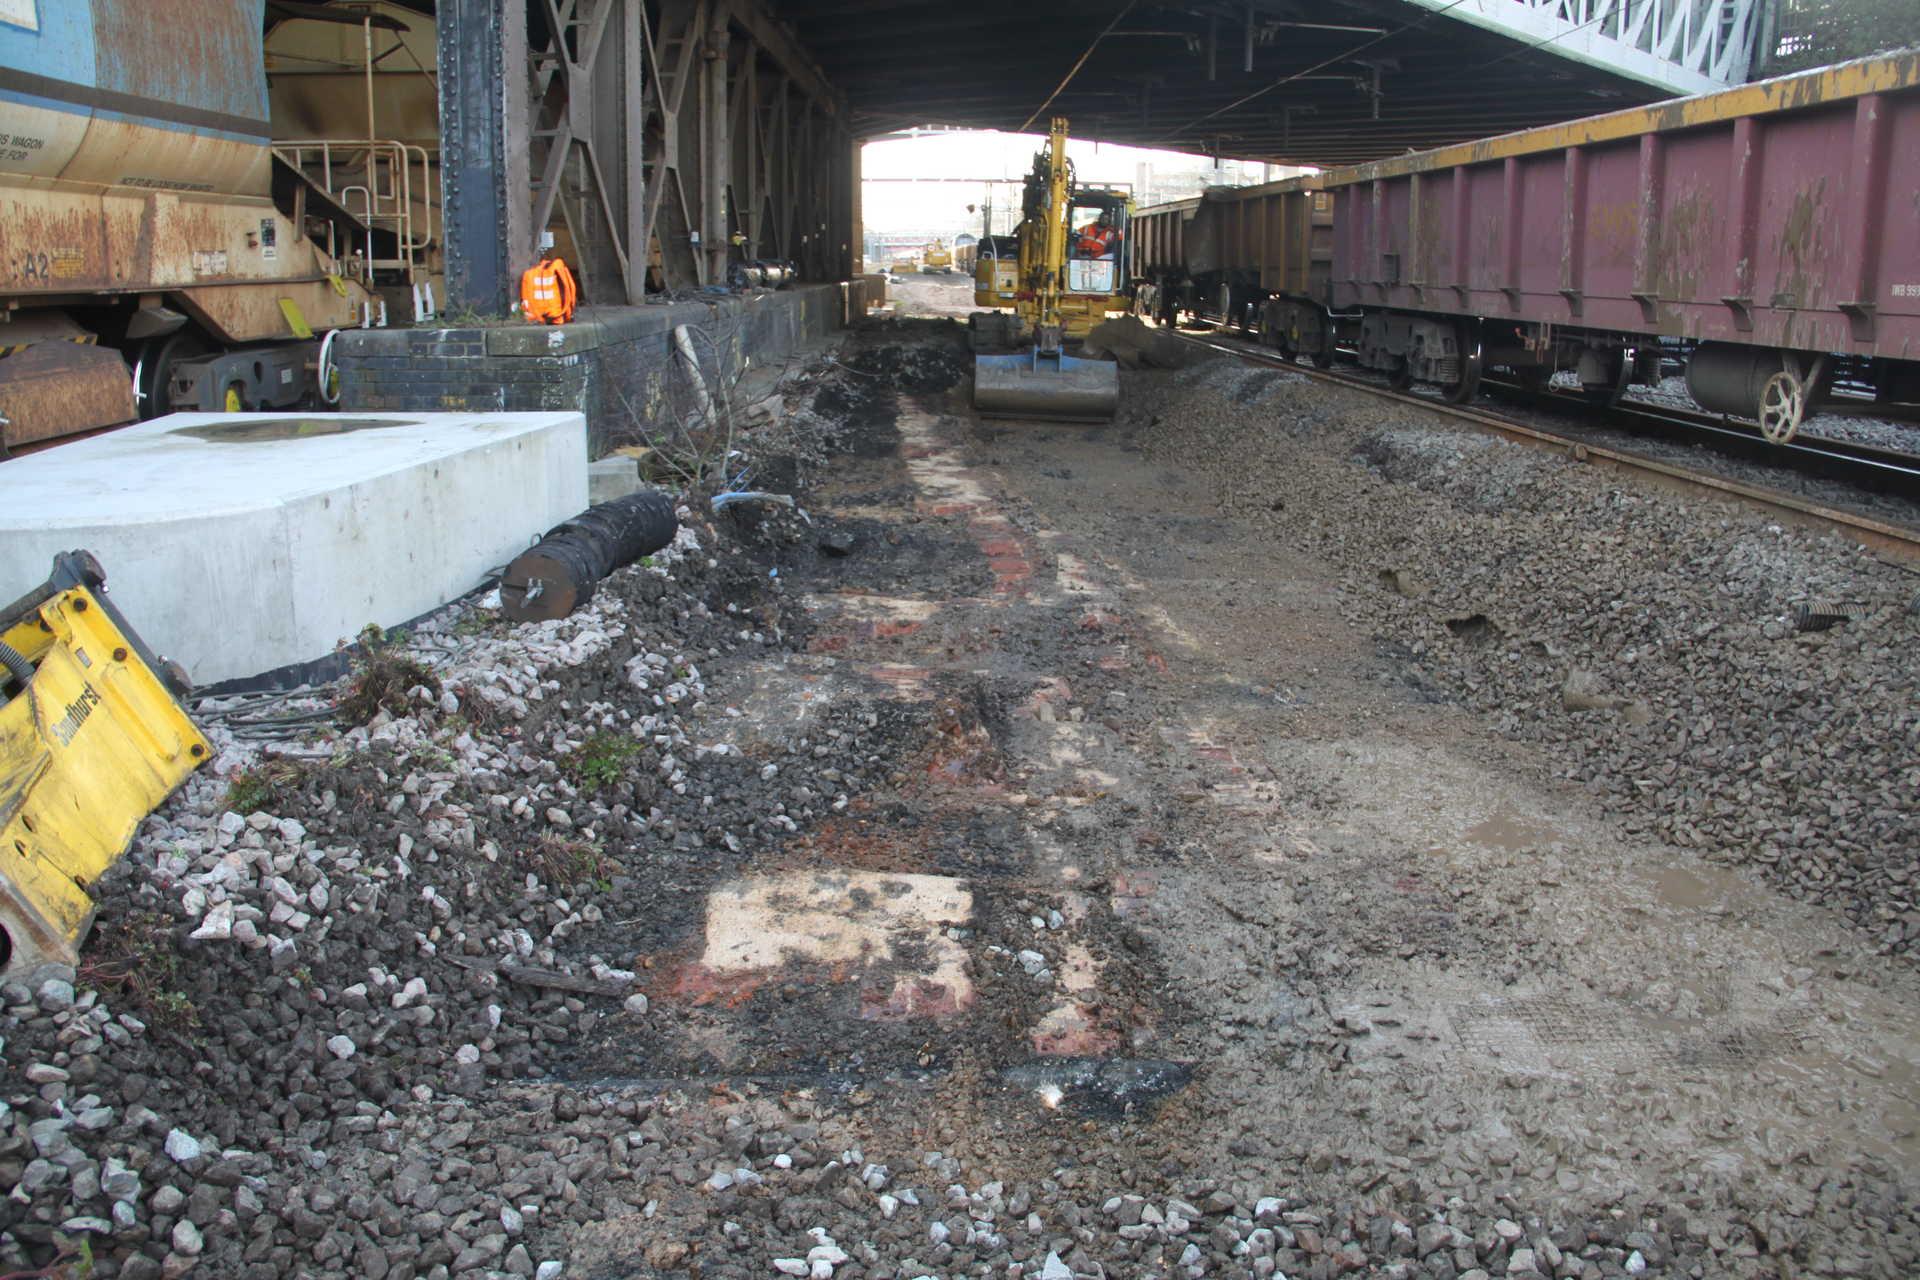 Part of a former engine shed - NR archaeology Paddington_239014.jpg